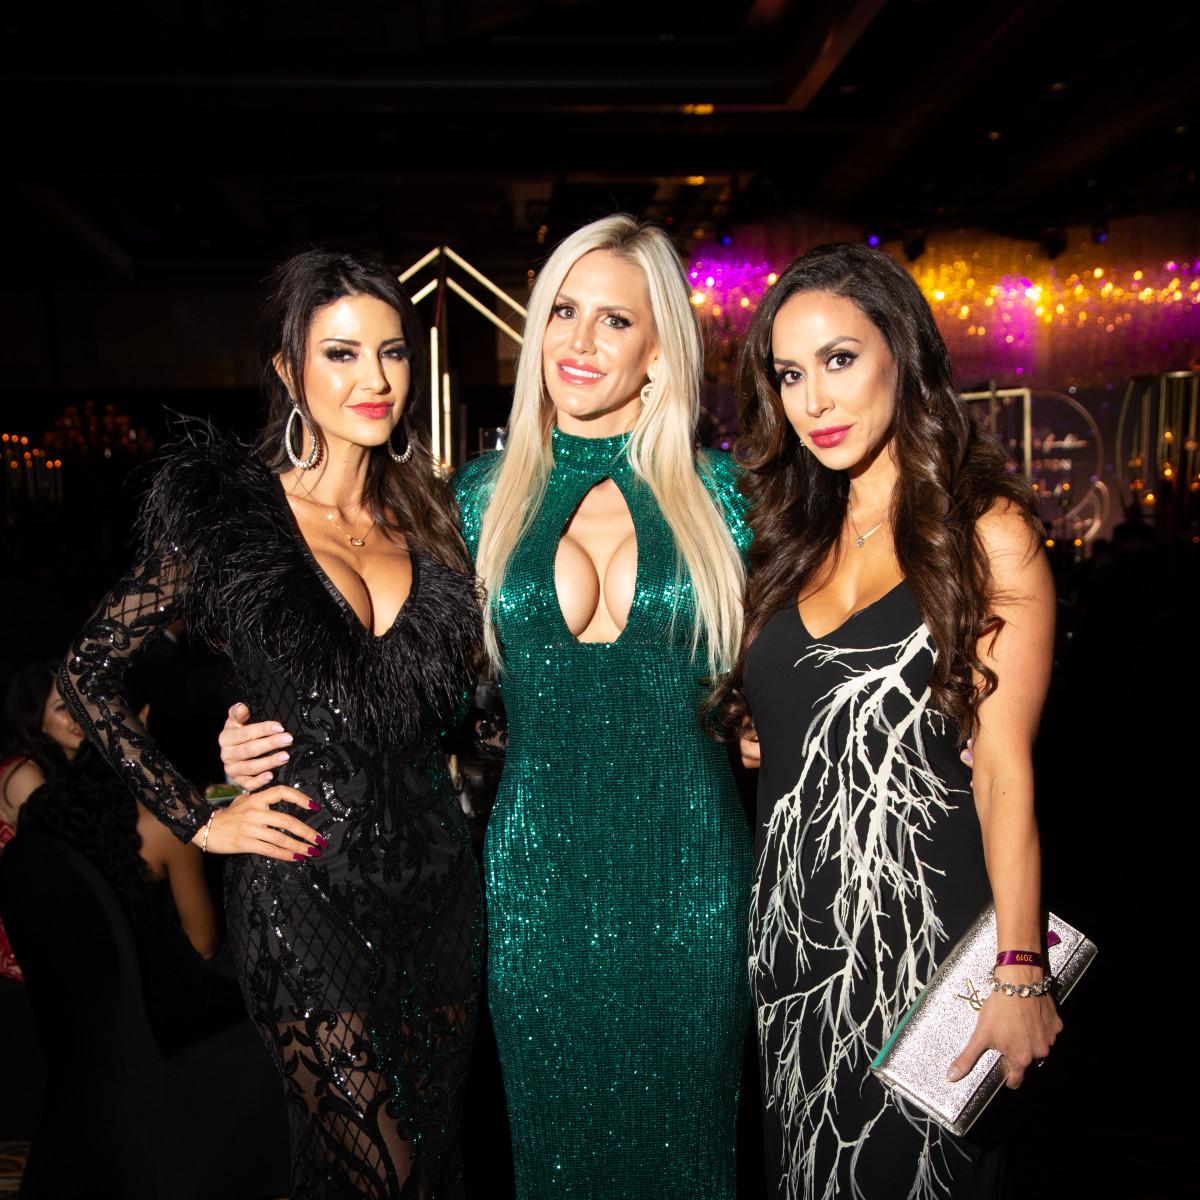 Altus Gala 2019 Nissreen Nasif, Jessica Hatch, Kerri Kayes